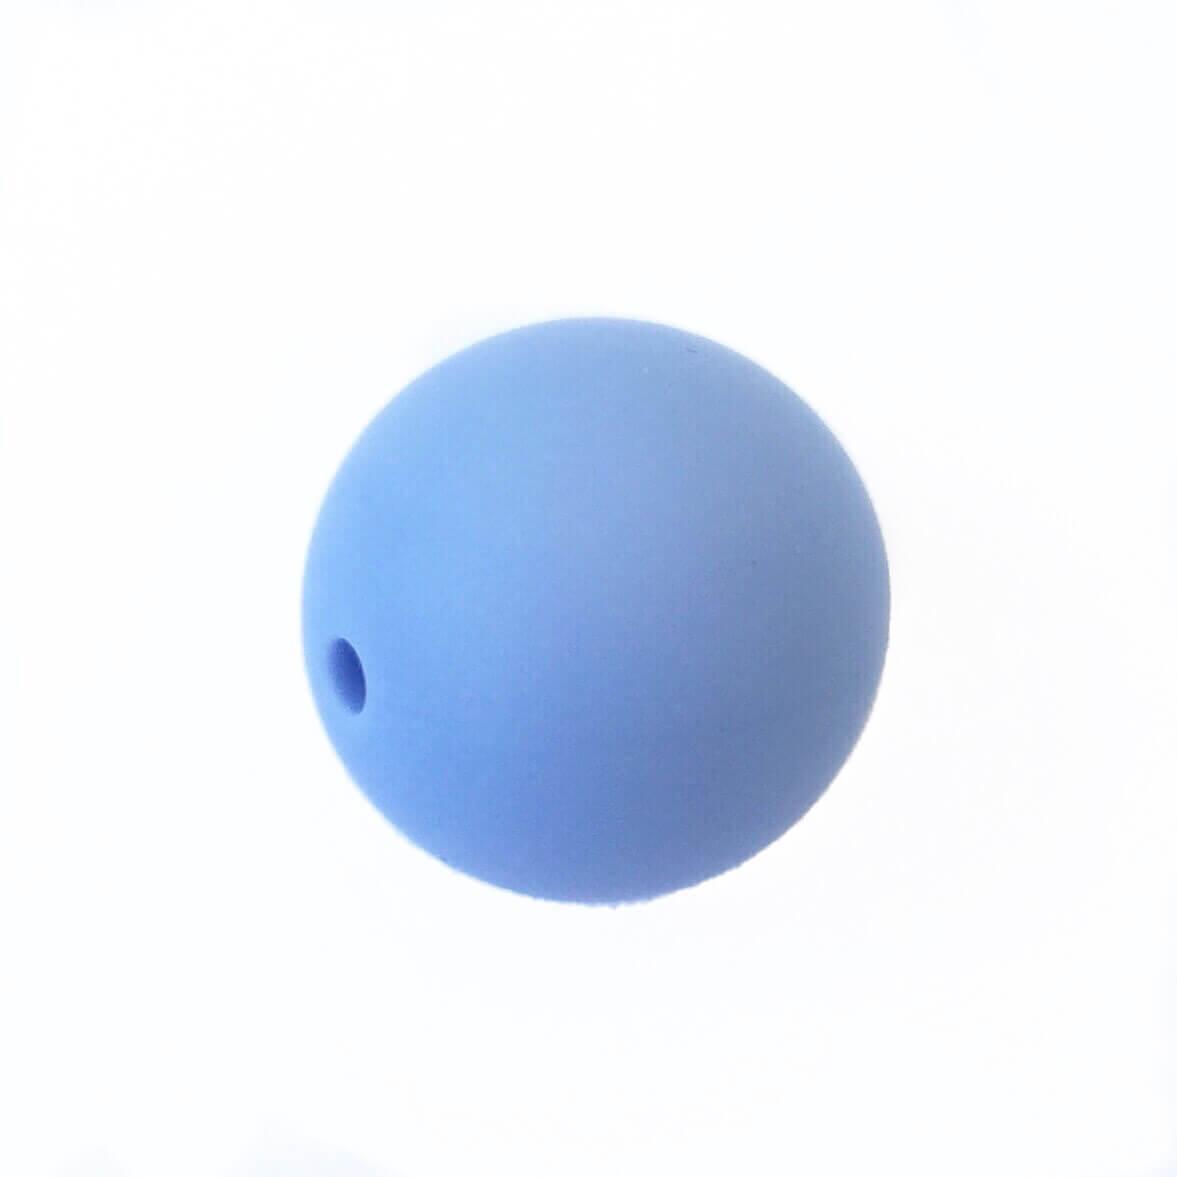 19 мм (серенити) круглая